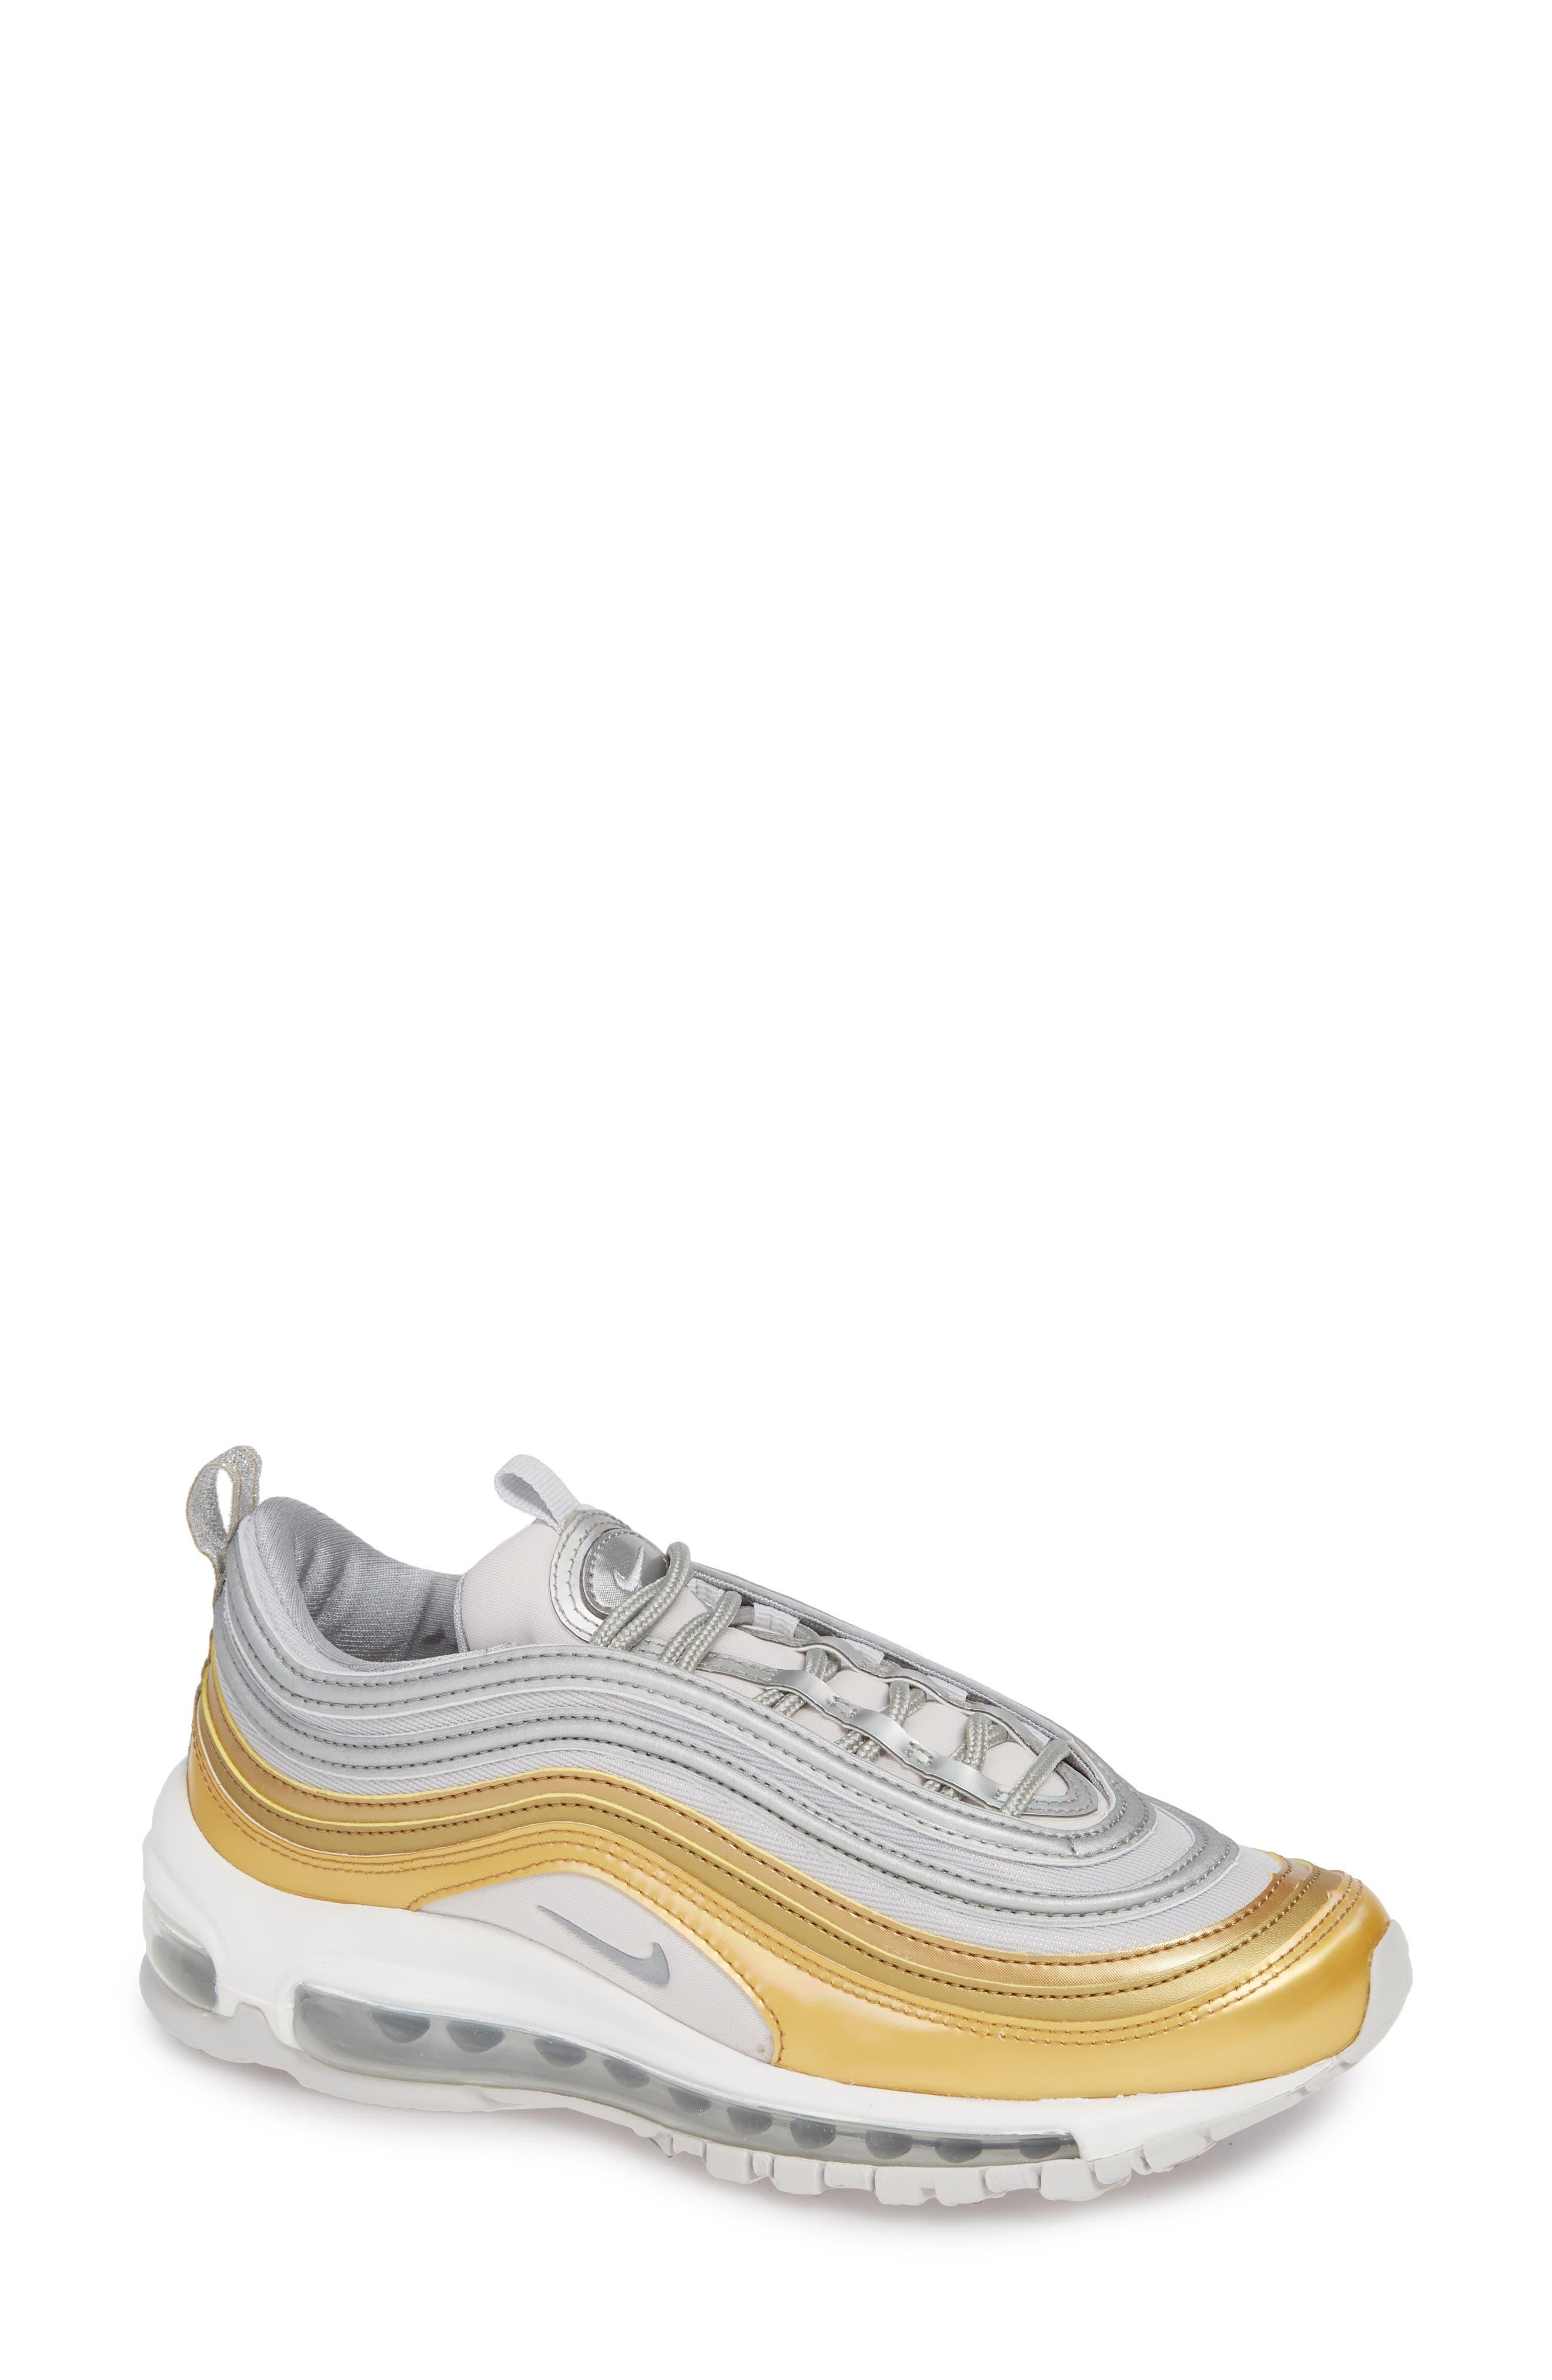 Air Max 97 SE Sneaker,                         Main,                         color, GREY/ METALLIC SILVER- GOLD